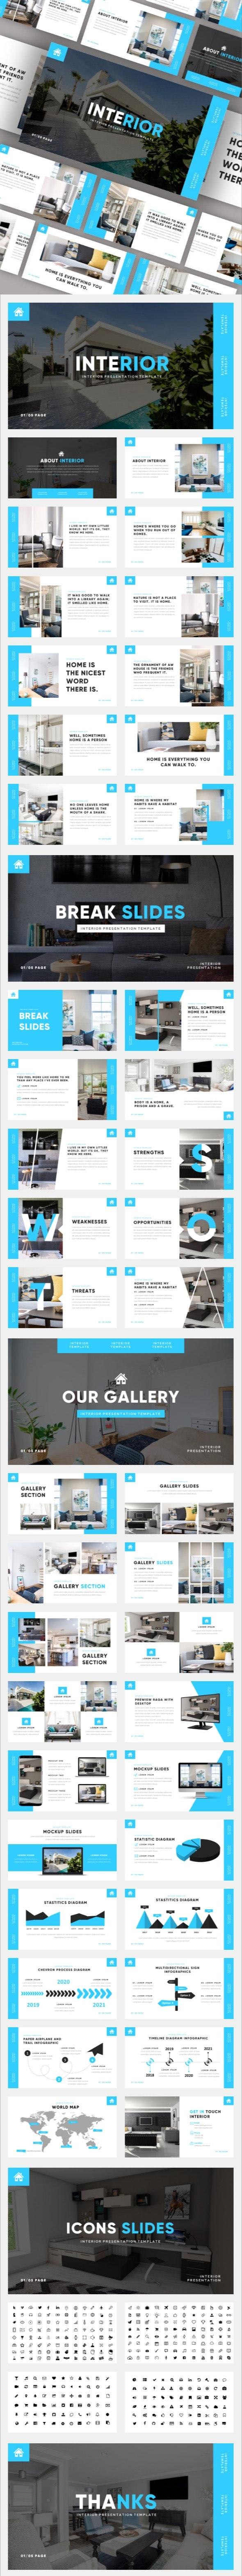 Interior - Furniture & Home Decoration Keynote Template - Business Keynote Templates